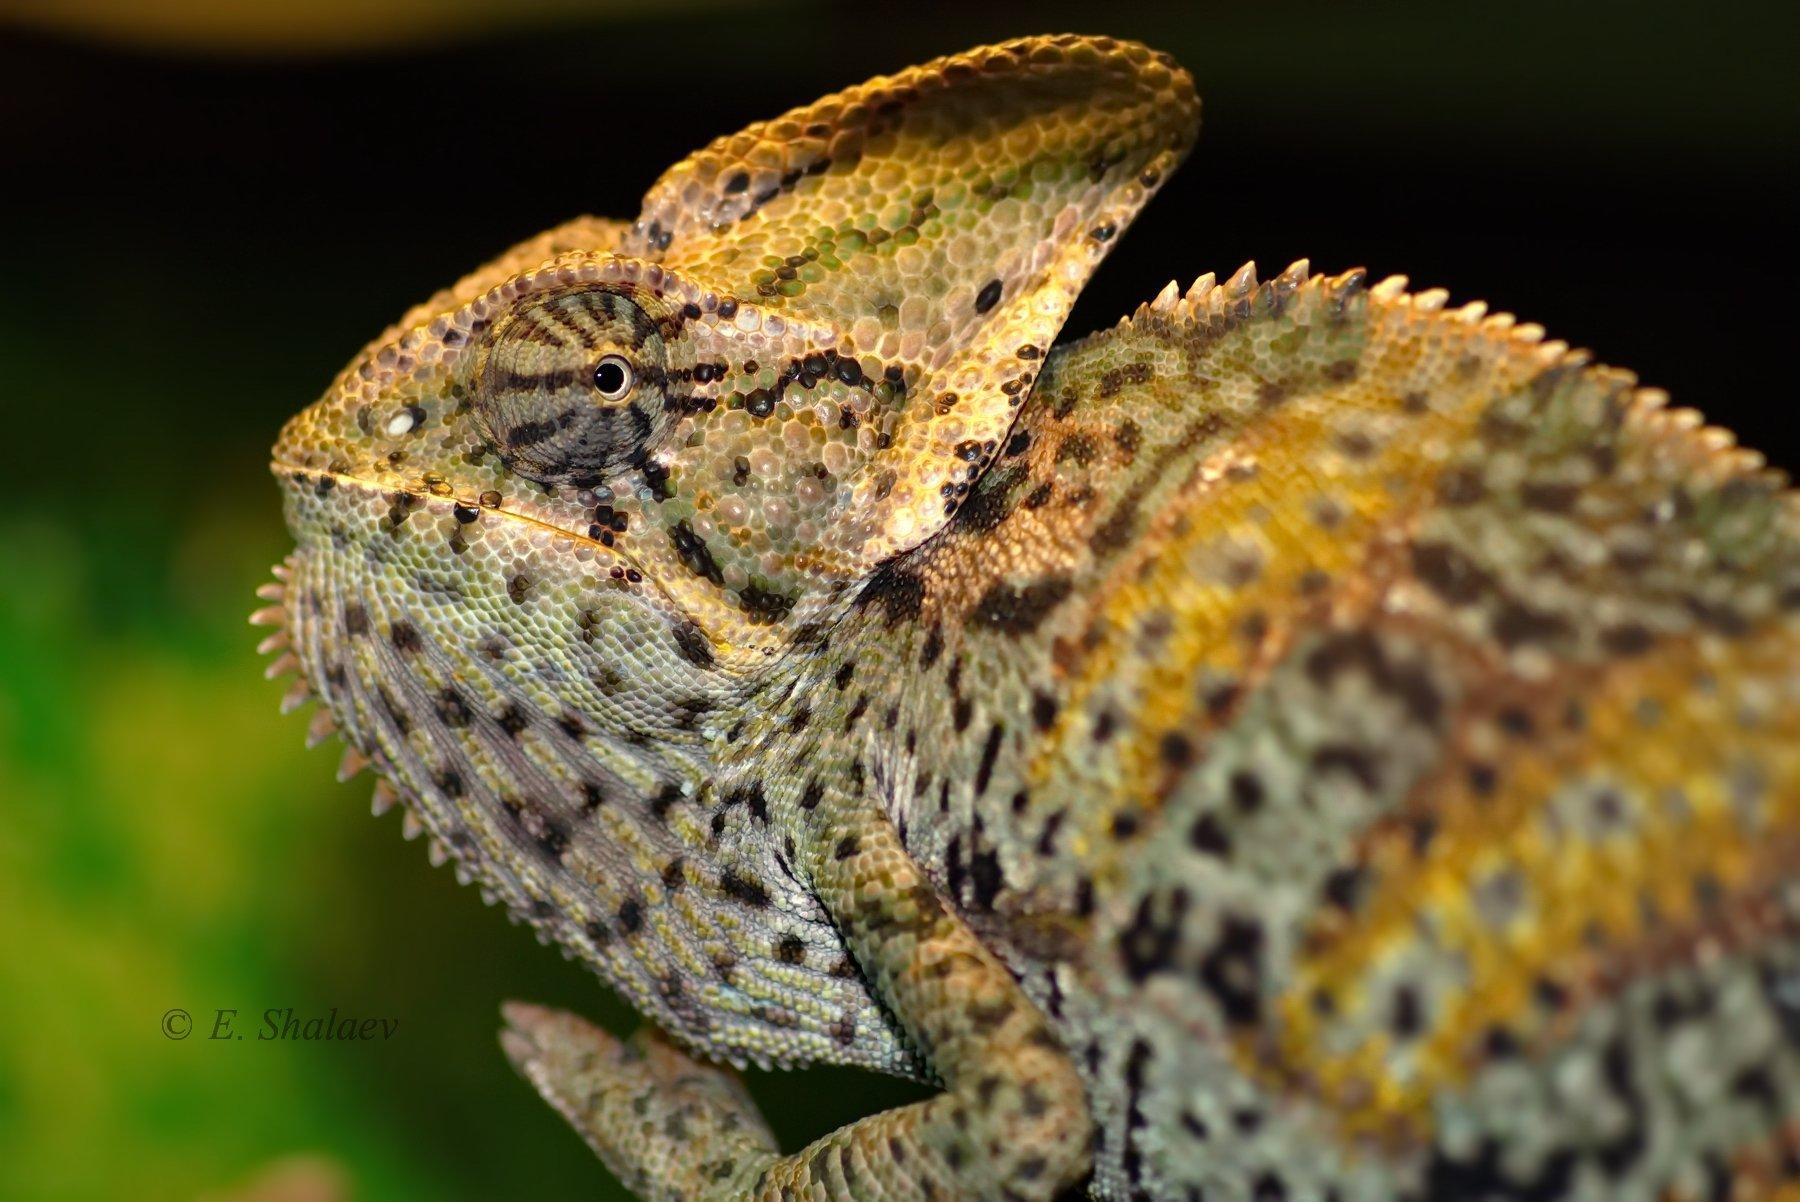 йеменский хамелеон,chamaeleo calyptratus,lizards,reptilia,рептилии,хамелеон,ящерица, Евгений